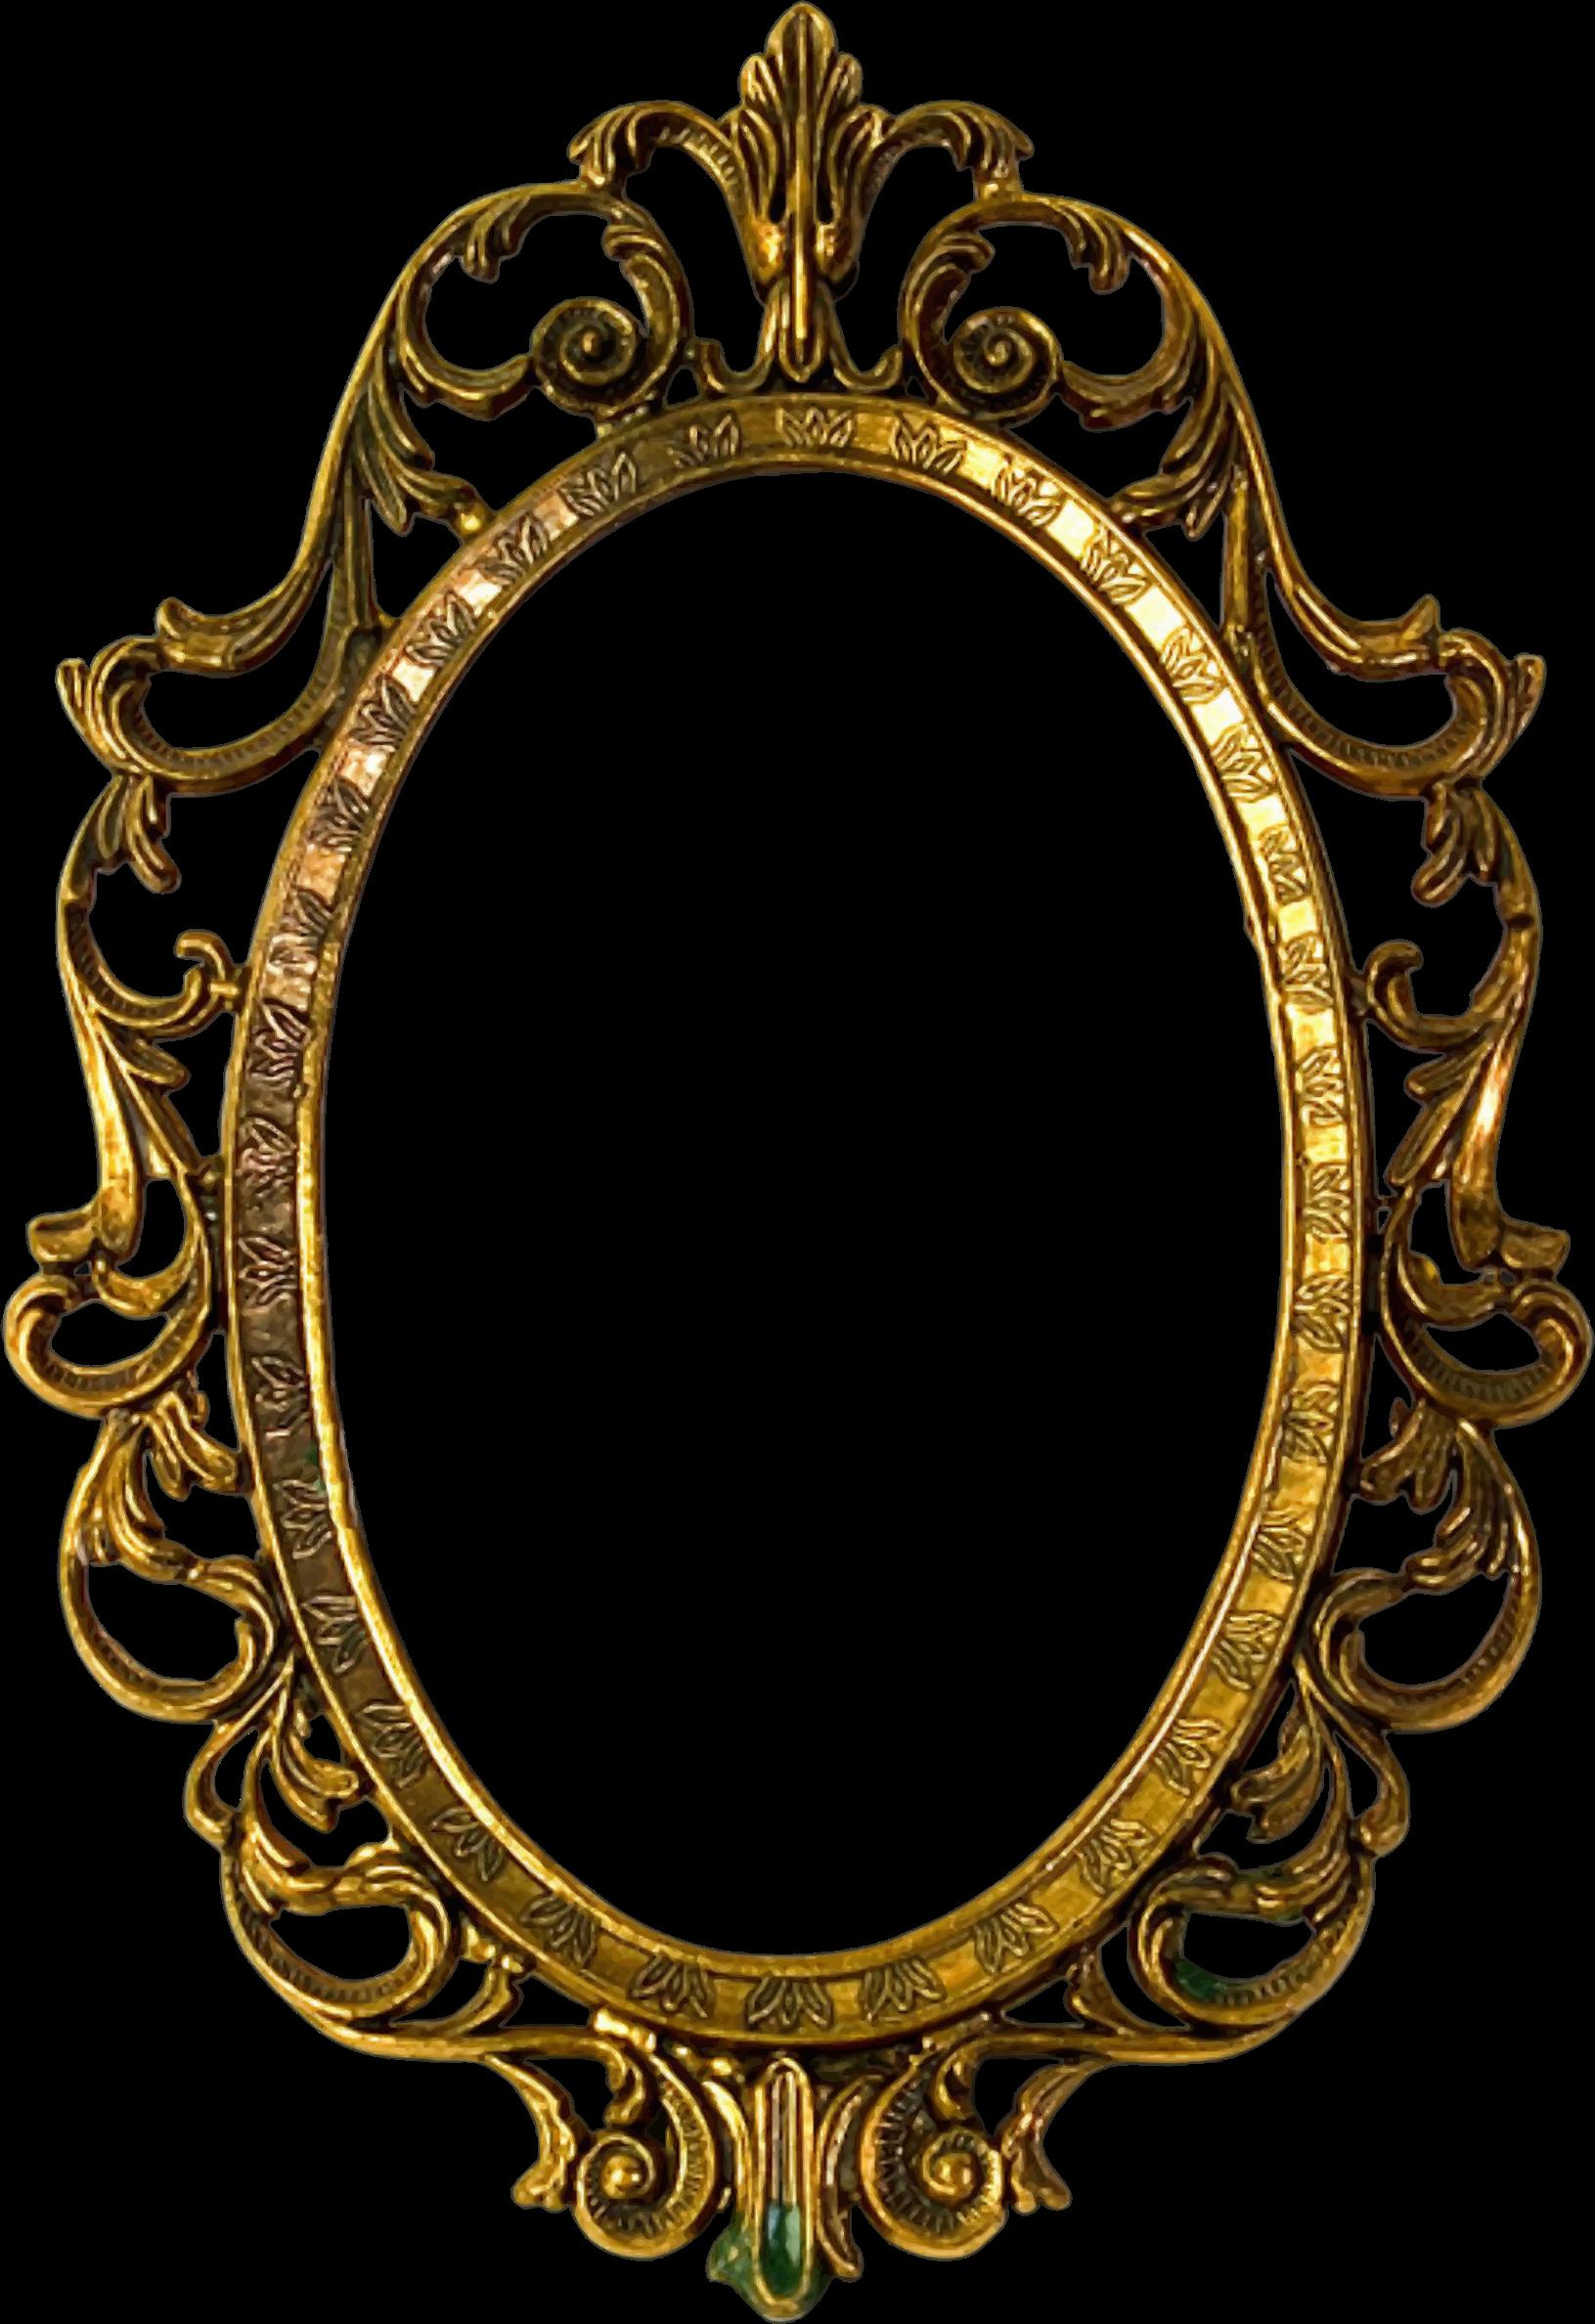 Pin De Roke Suger Em Free To Use Moldura De Espelho Molduras Vintage Bordas Vintage